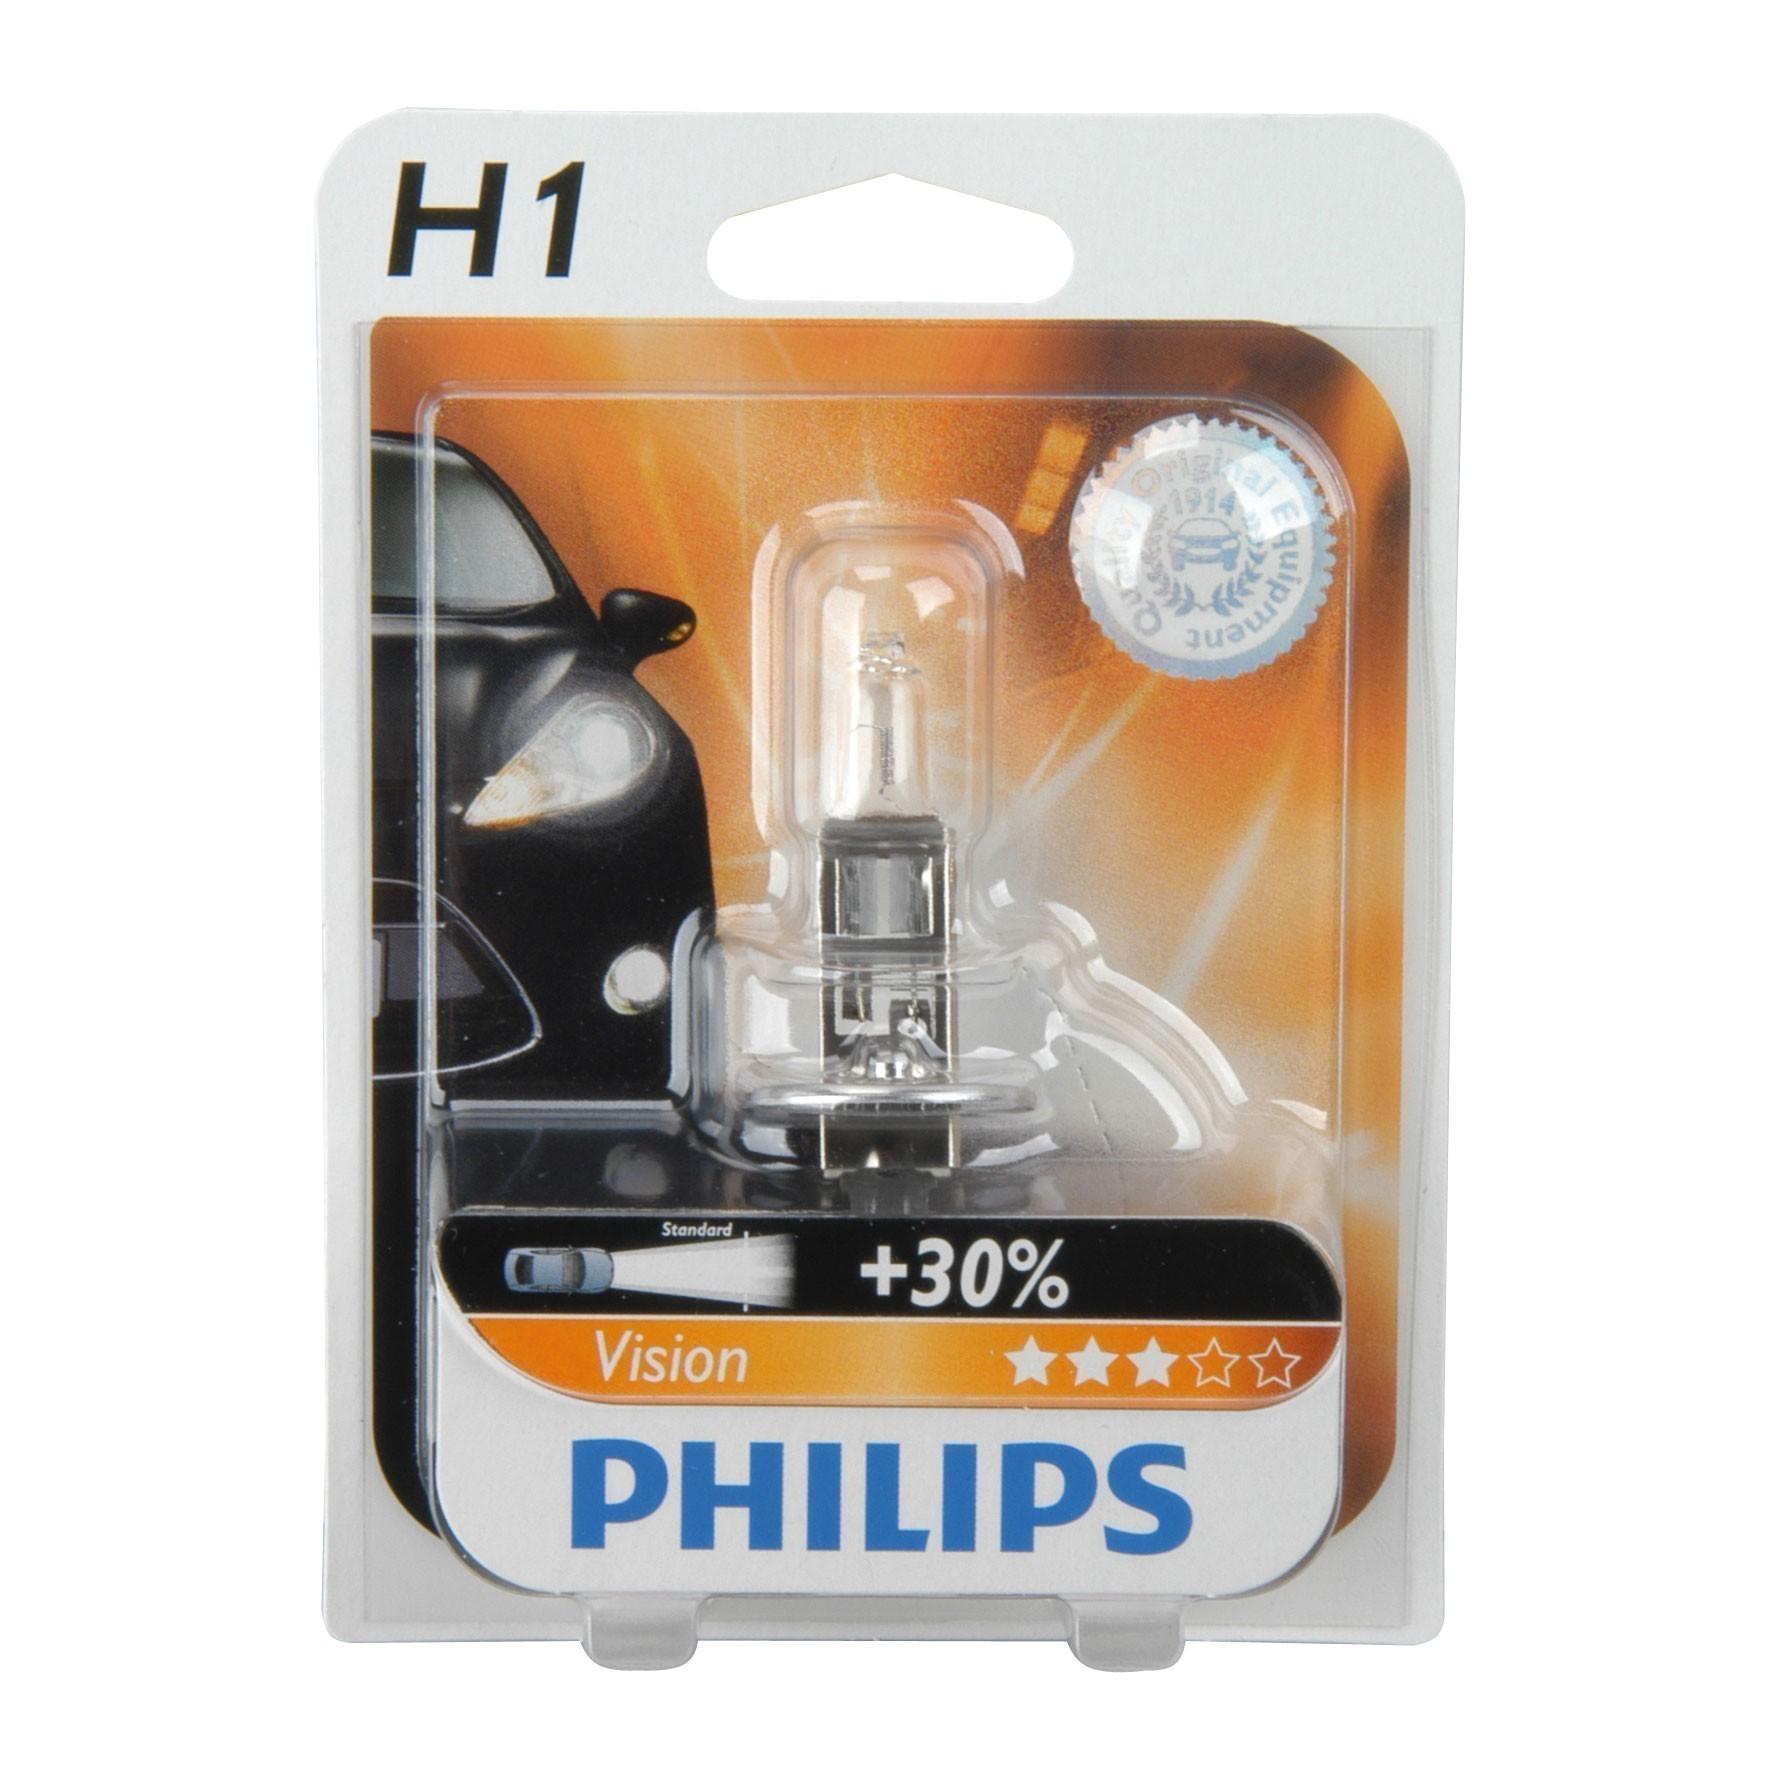 Philips Vision Halogenlampe H1 12 Volt / 55 Watt - Autobeleuchtung Bild 1